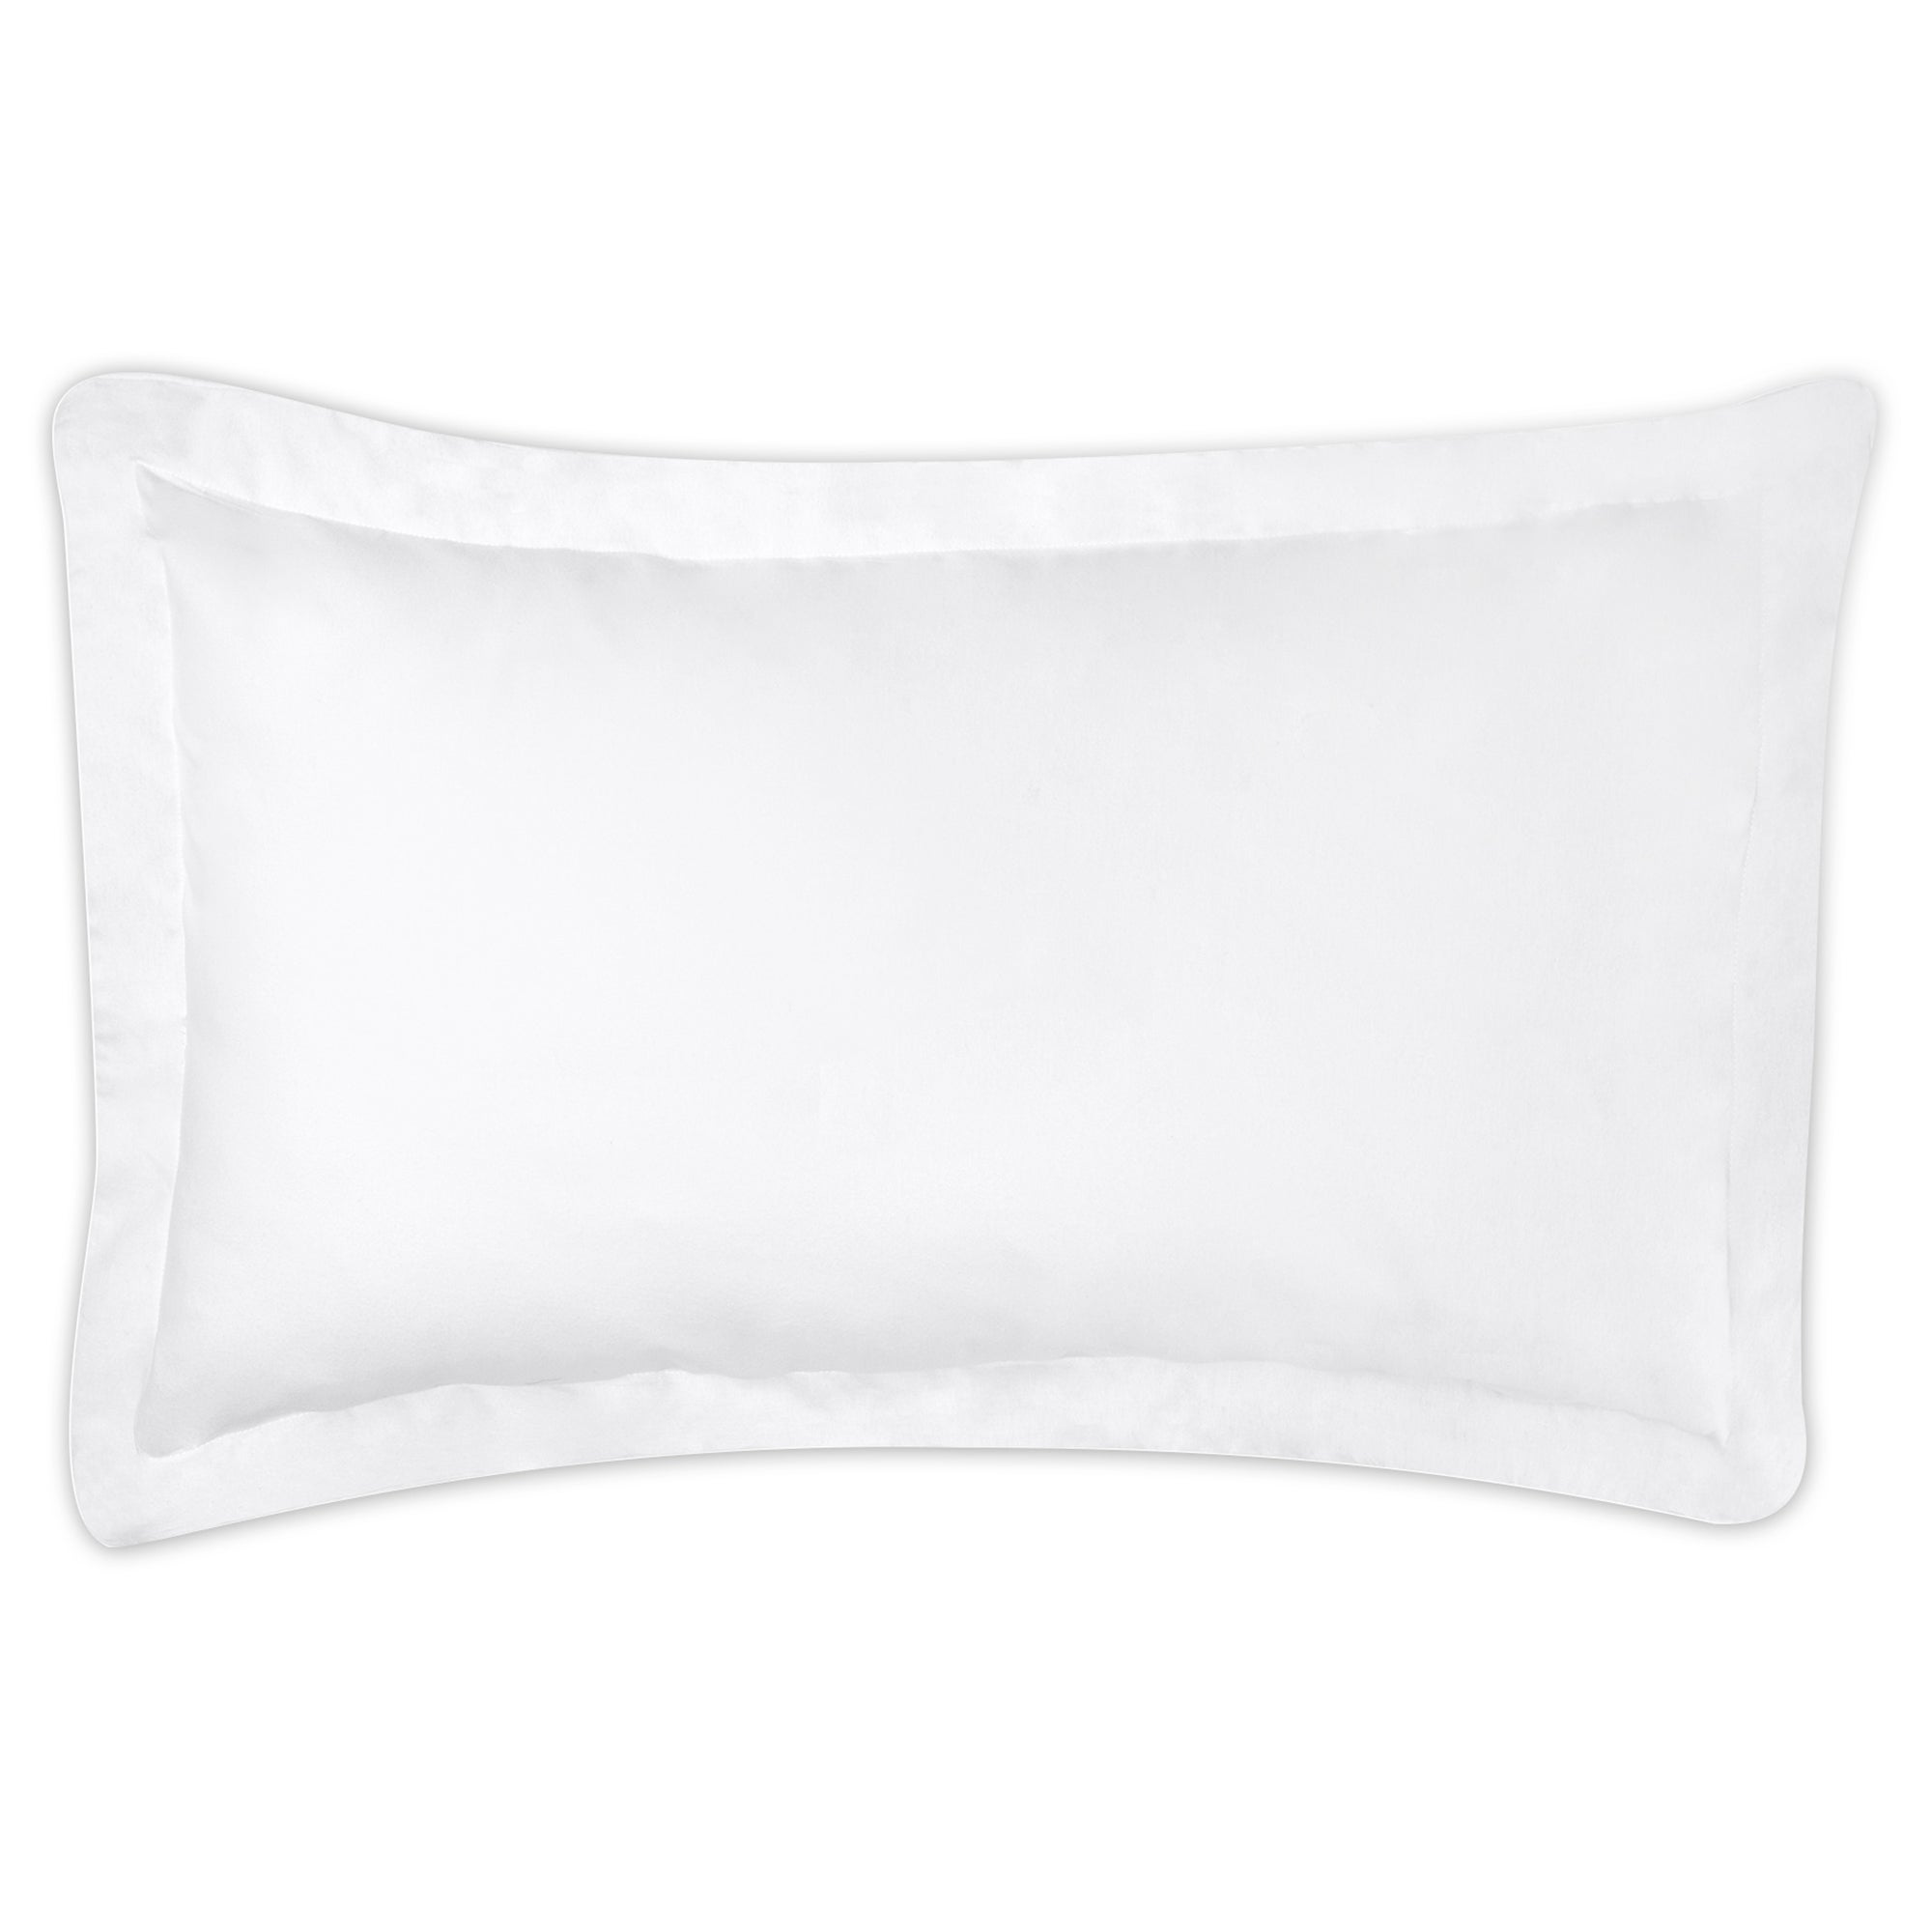 Dorma White Velvety Soft Oxford Pillowcase